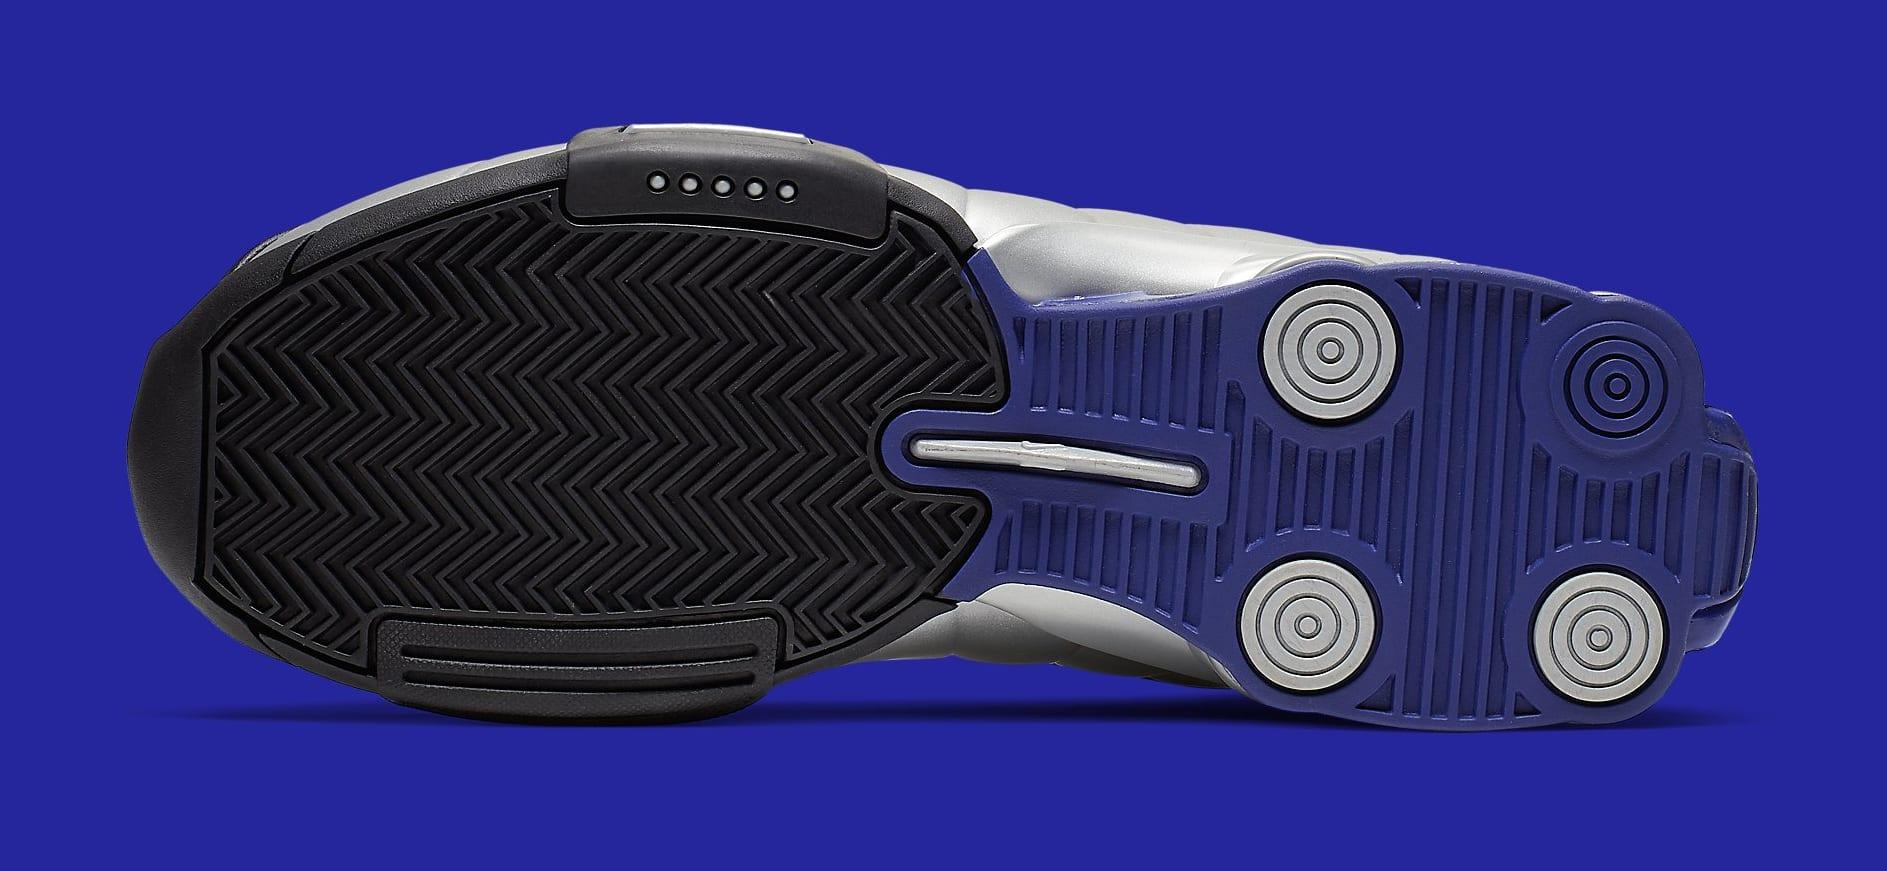 Nike Shox BB4 OG 'Metallic Silver' AT7843-001 Sole